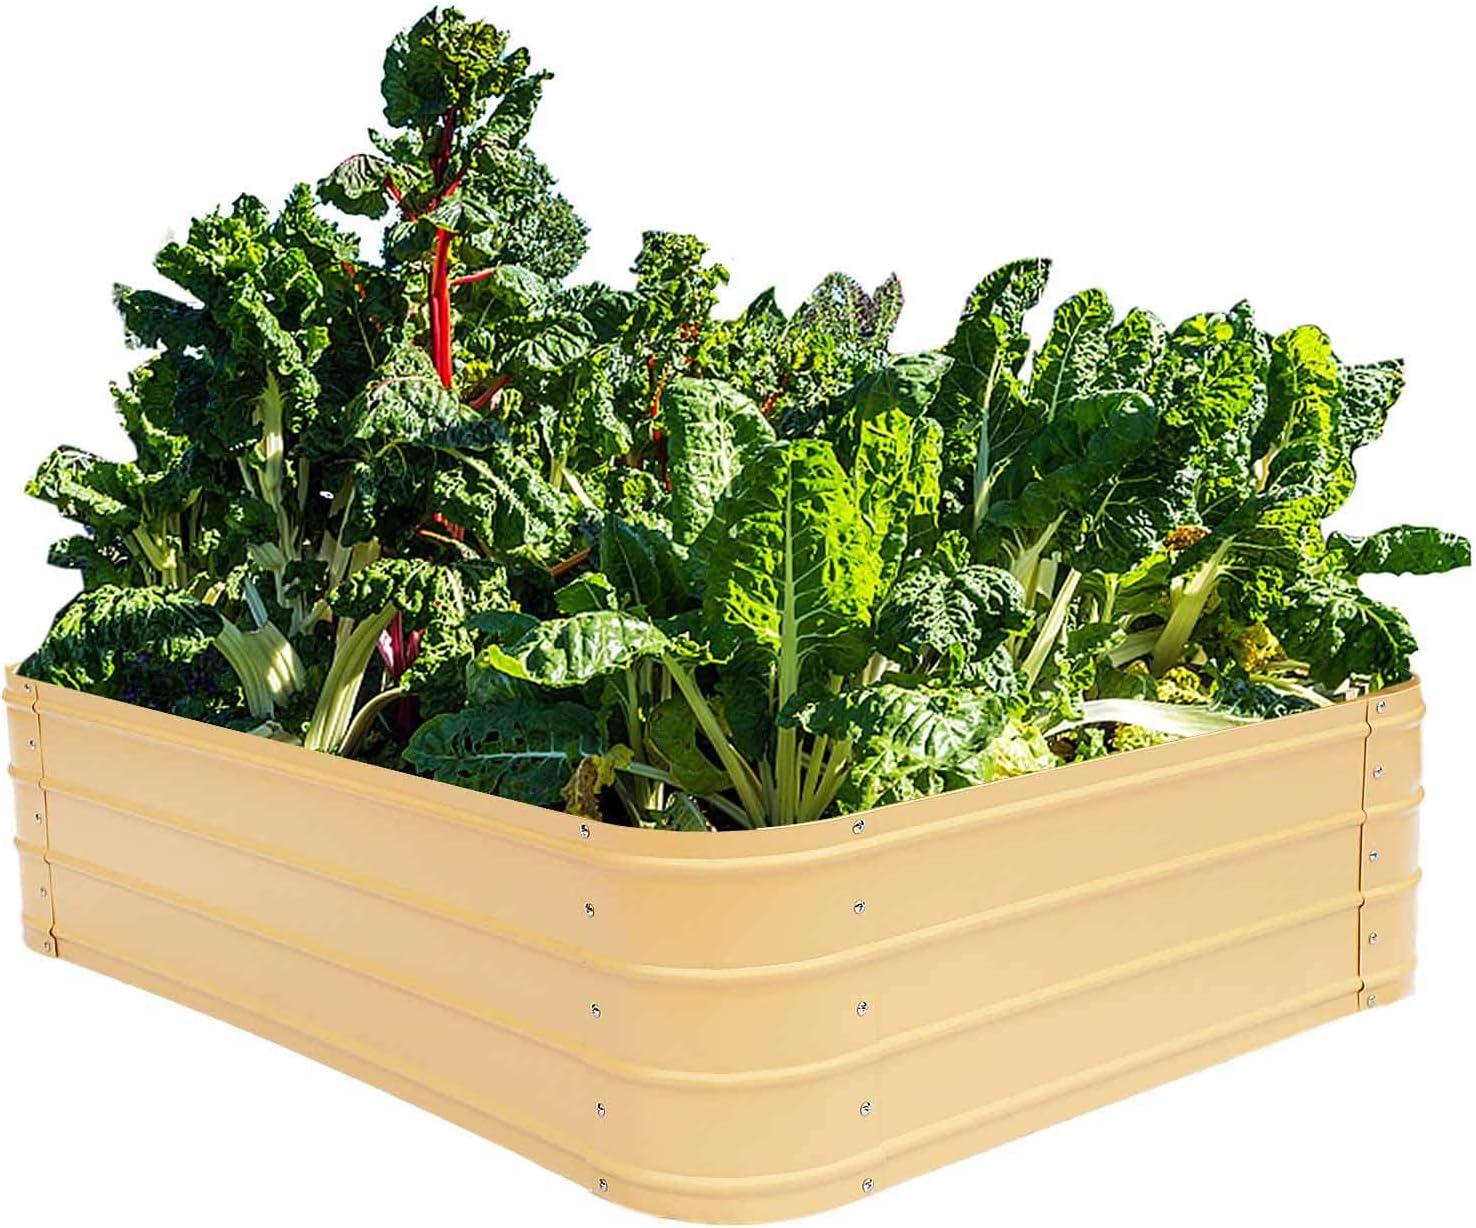 Metal Raised Garden Beds for Vegetables Outdoor Planter Box Galvanized Steel Gardening Flower Bed Kits 4x3x1 Ft (Wheat)